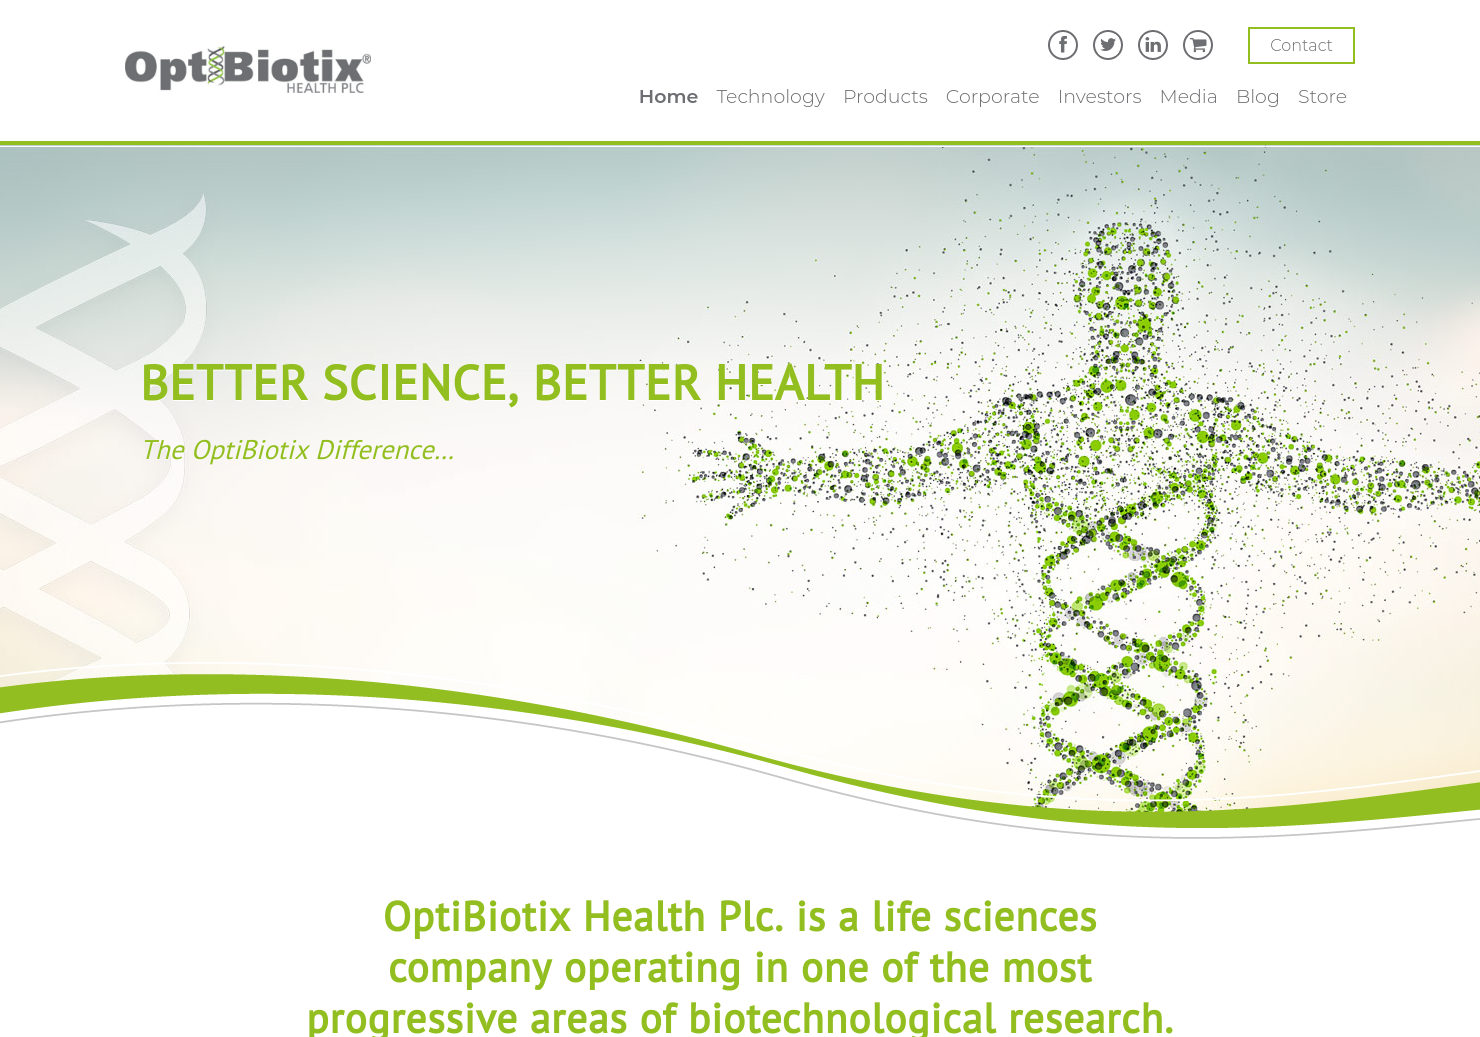 OptiBiotix Health Home Page